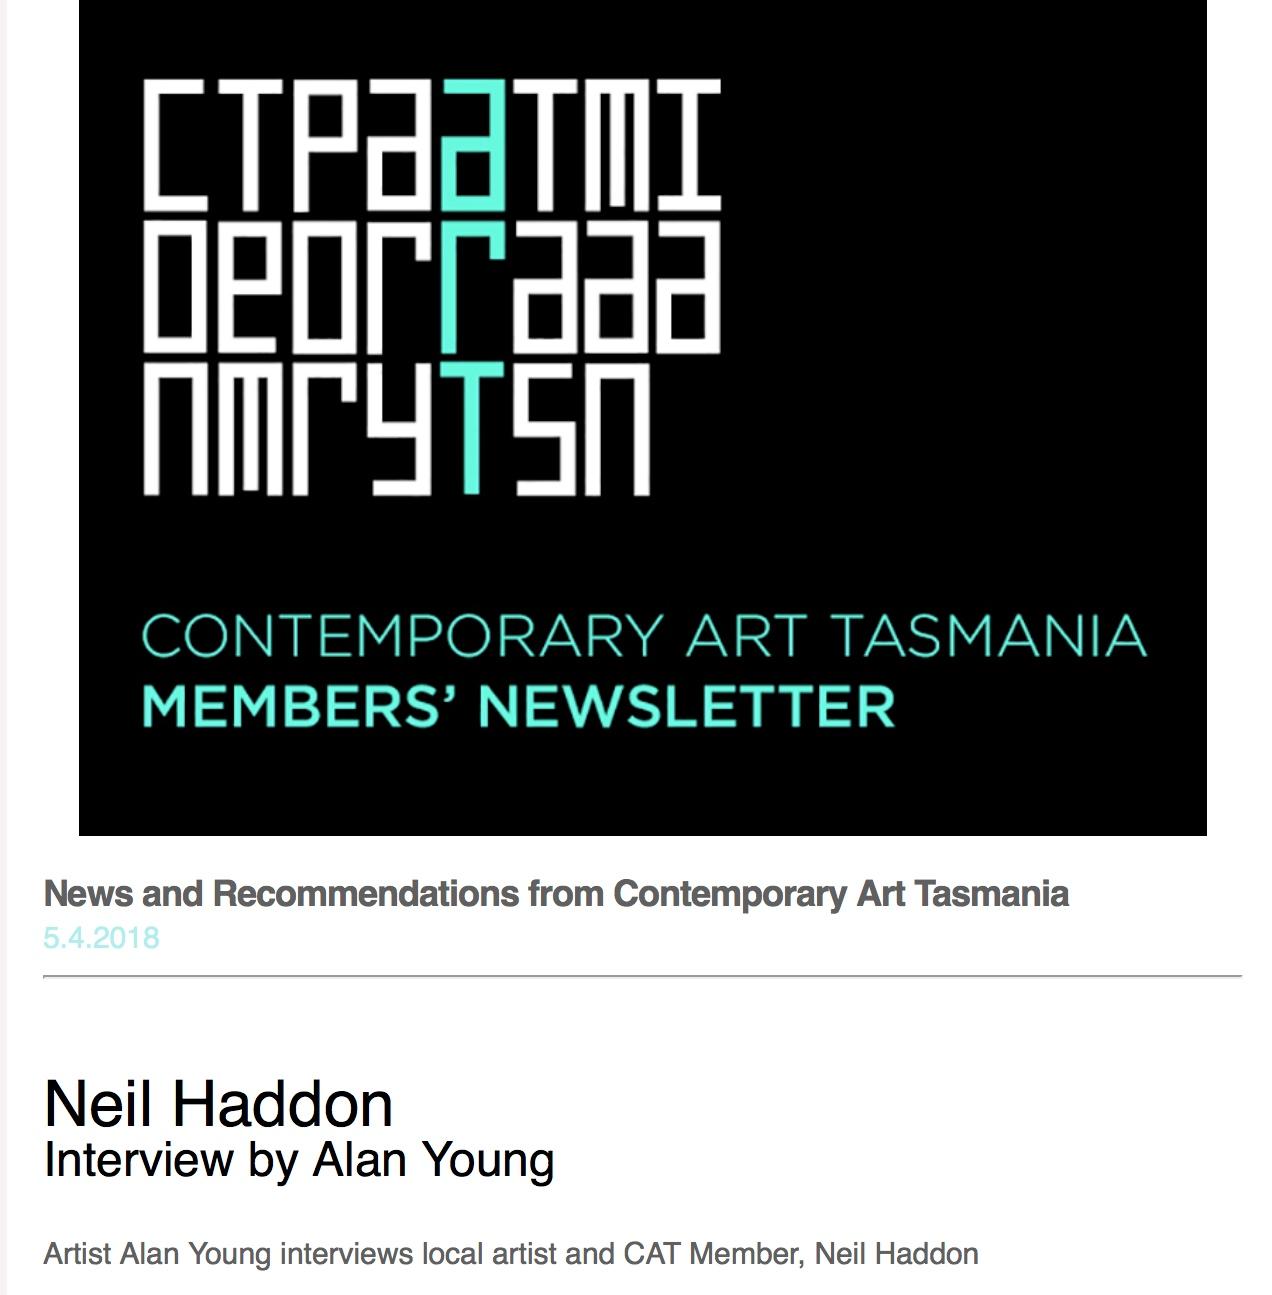 http://www.contemporaryarttasmania.org